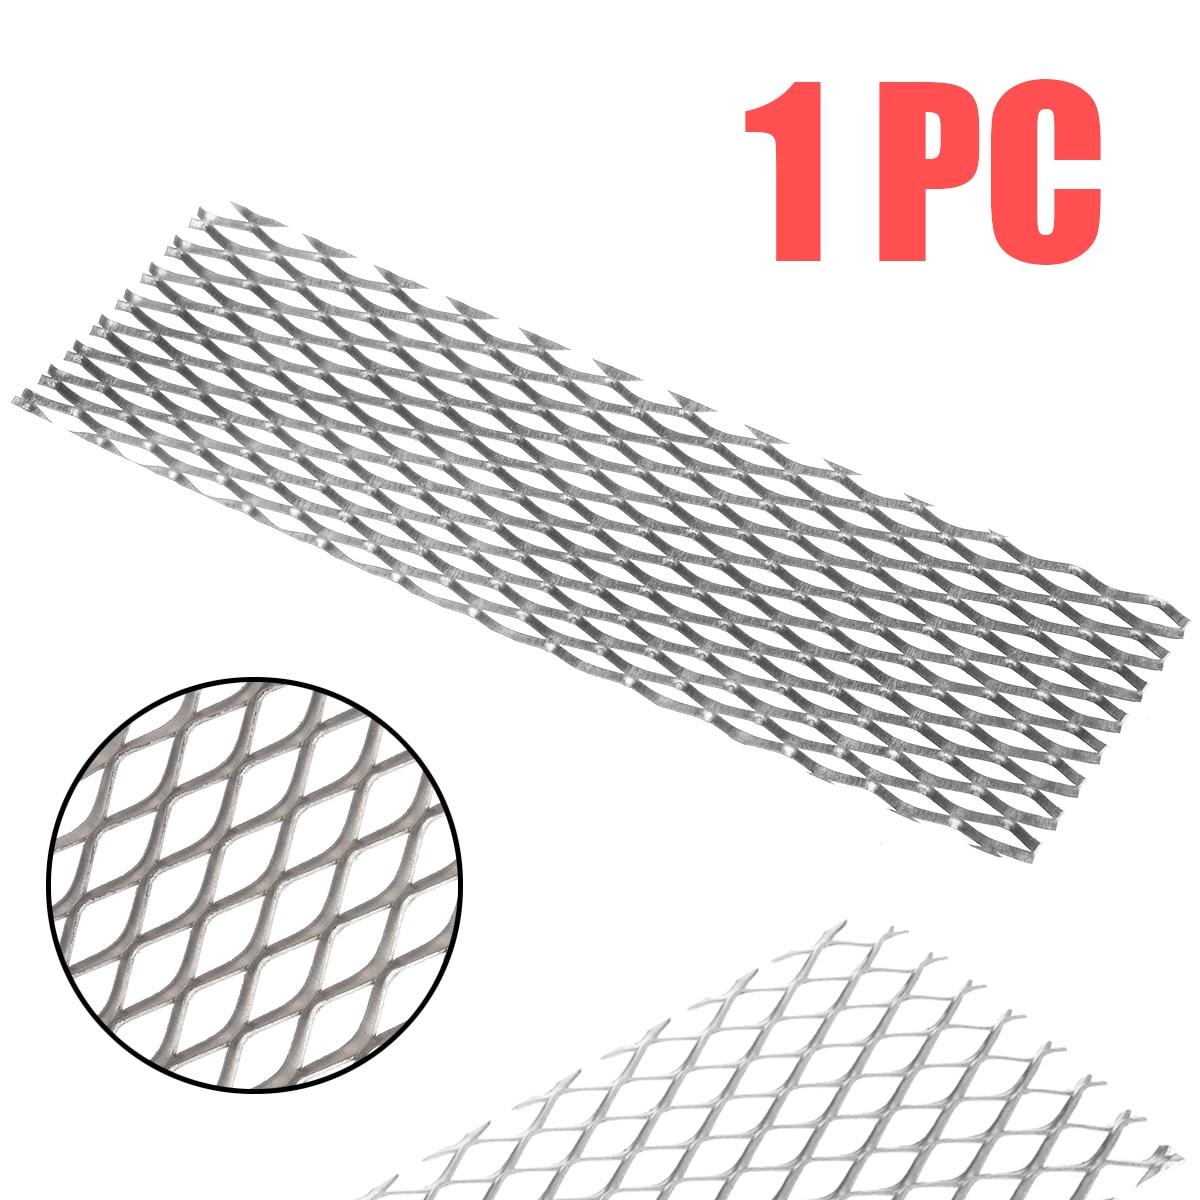 1pc Electrode Pure Titanium Mesh Sheet Recycled Metal Titanium Mesh Sheet For Electrolysis 0.5 Mm Thickness